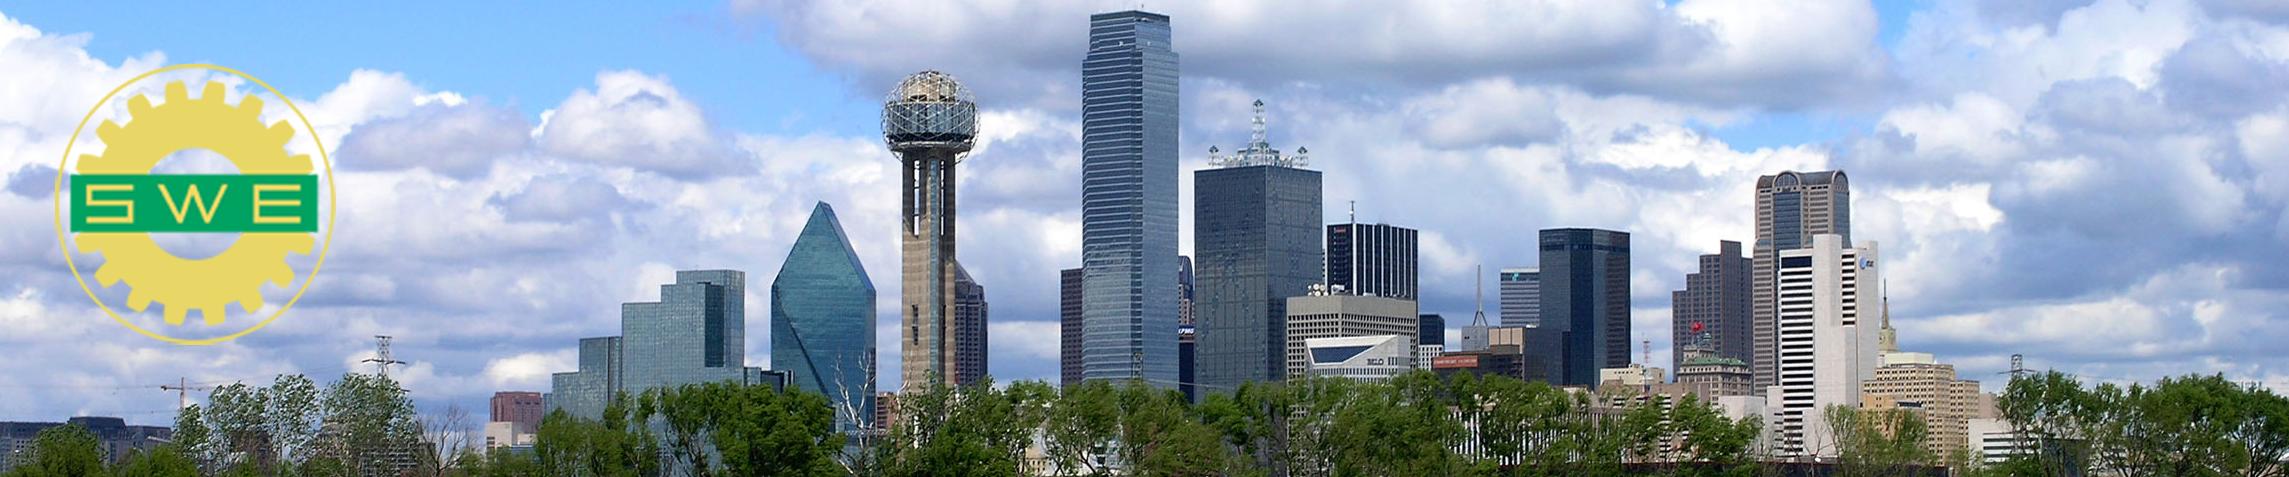 SWE Dallas Header